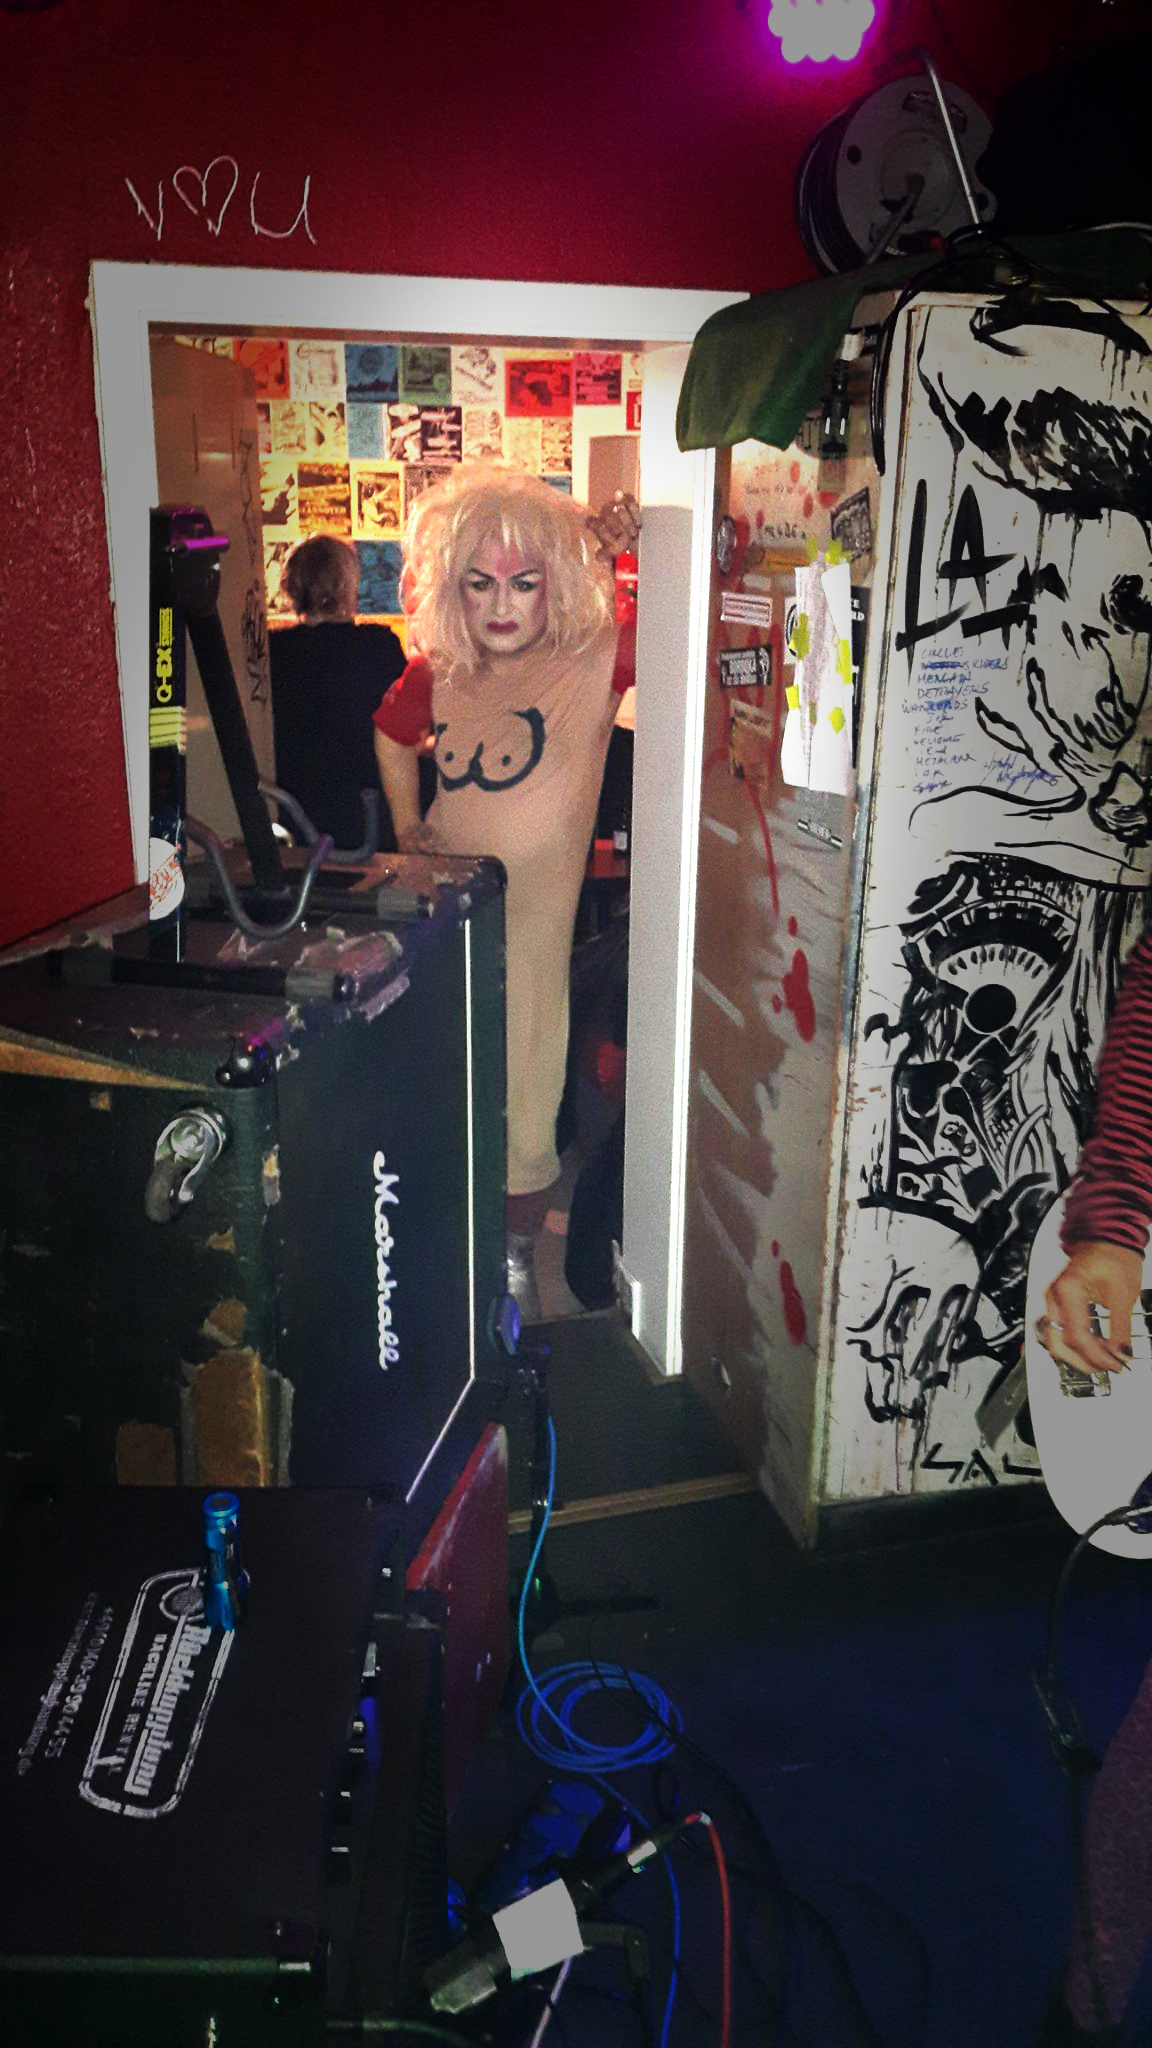 Anita_backstage